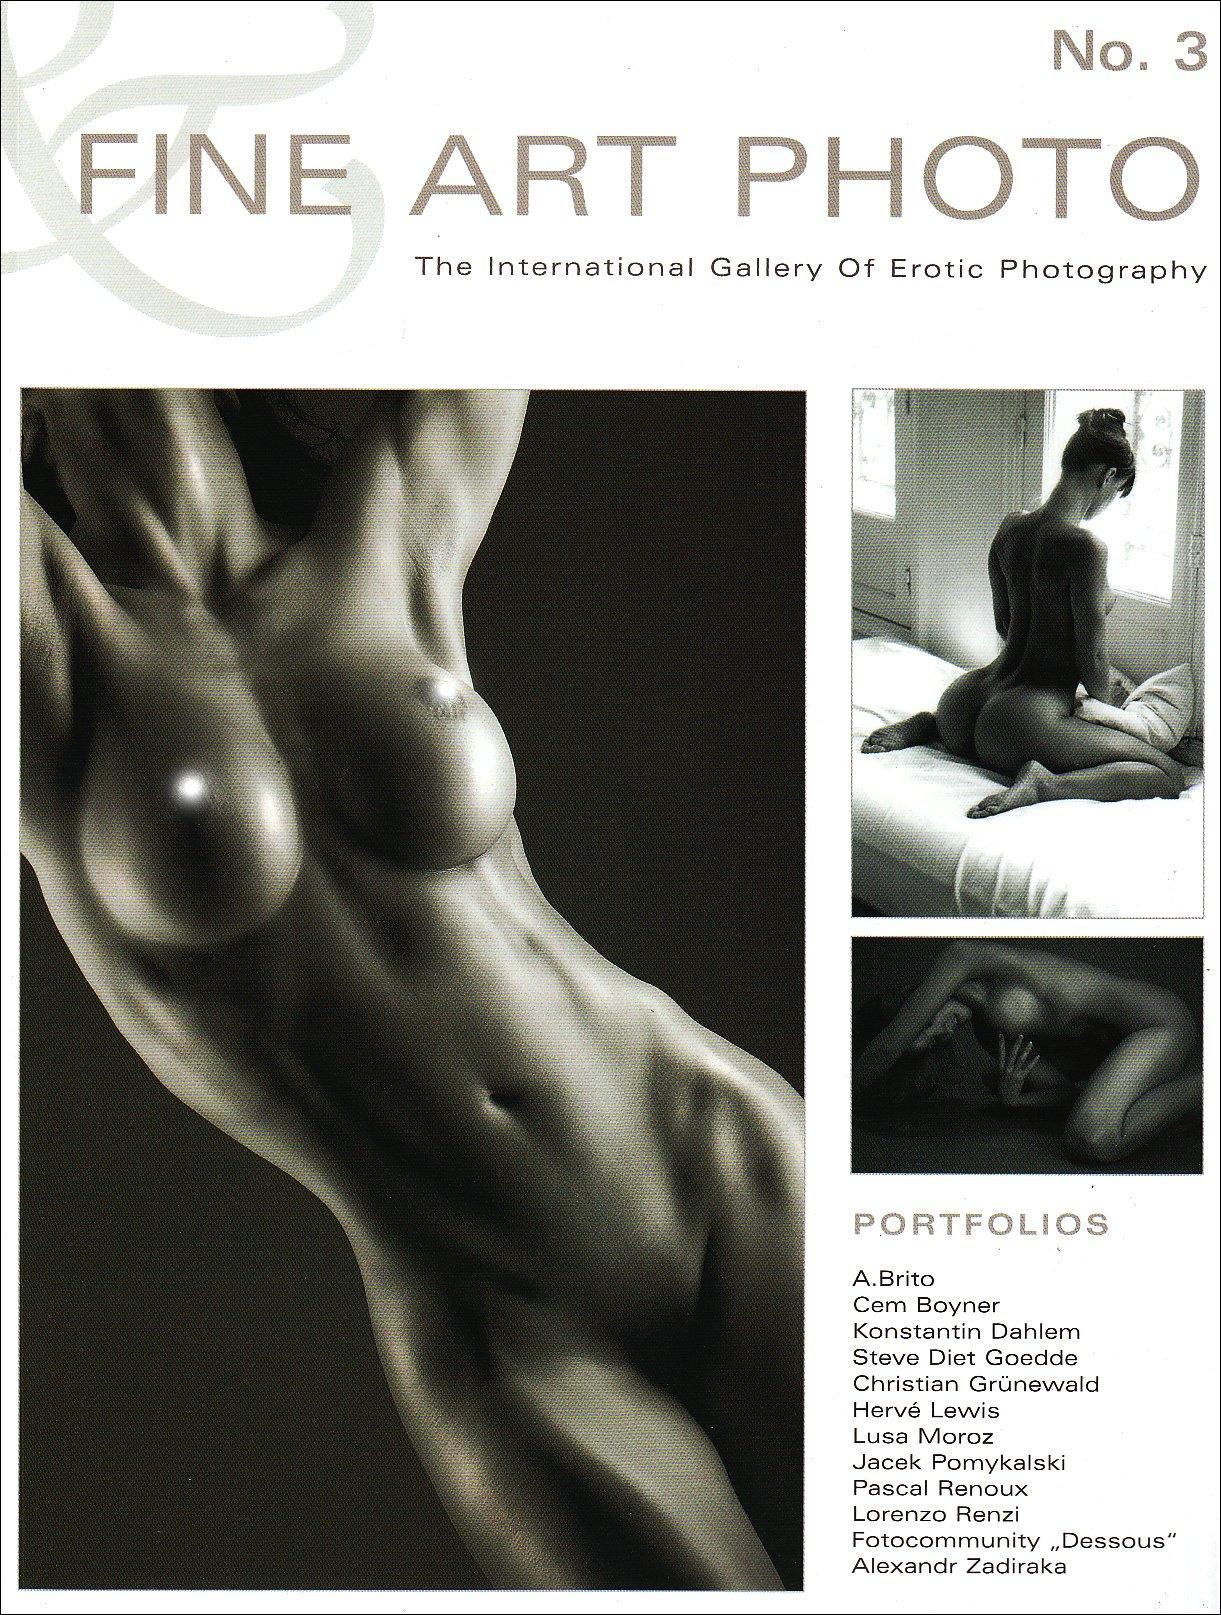 Fine Art Photo 3: The International Gallery of Erotic Photography